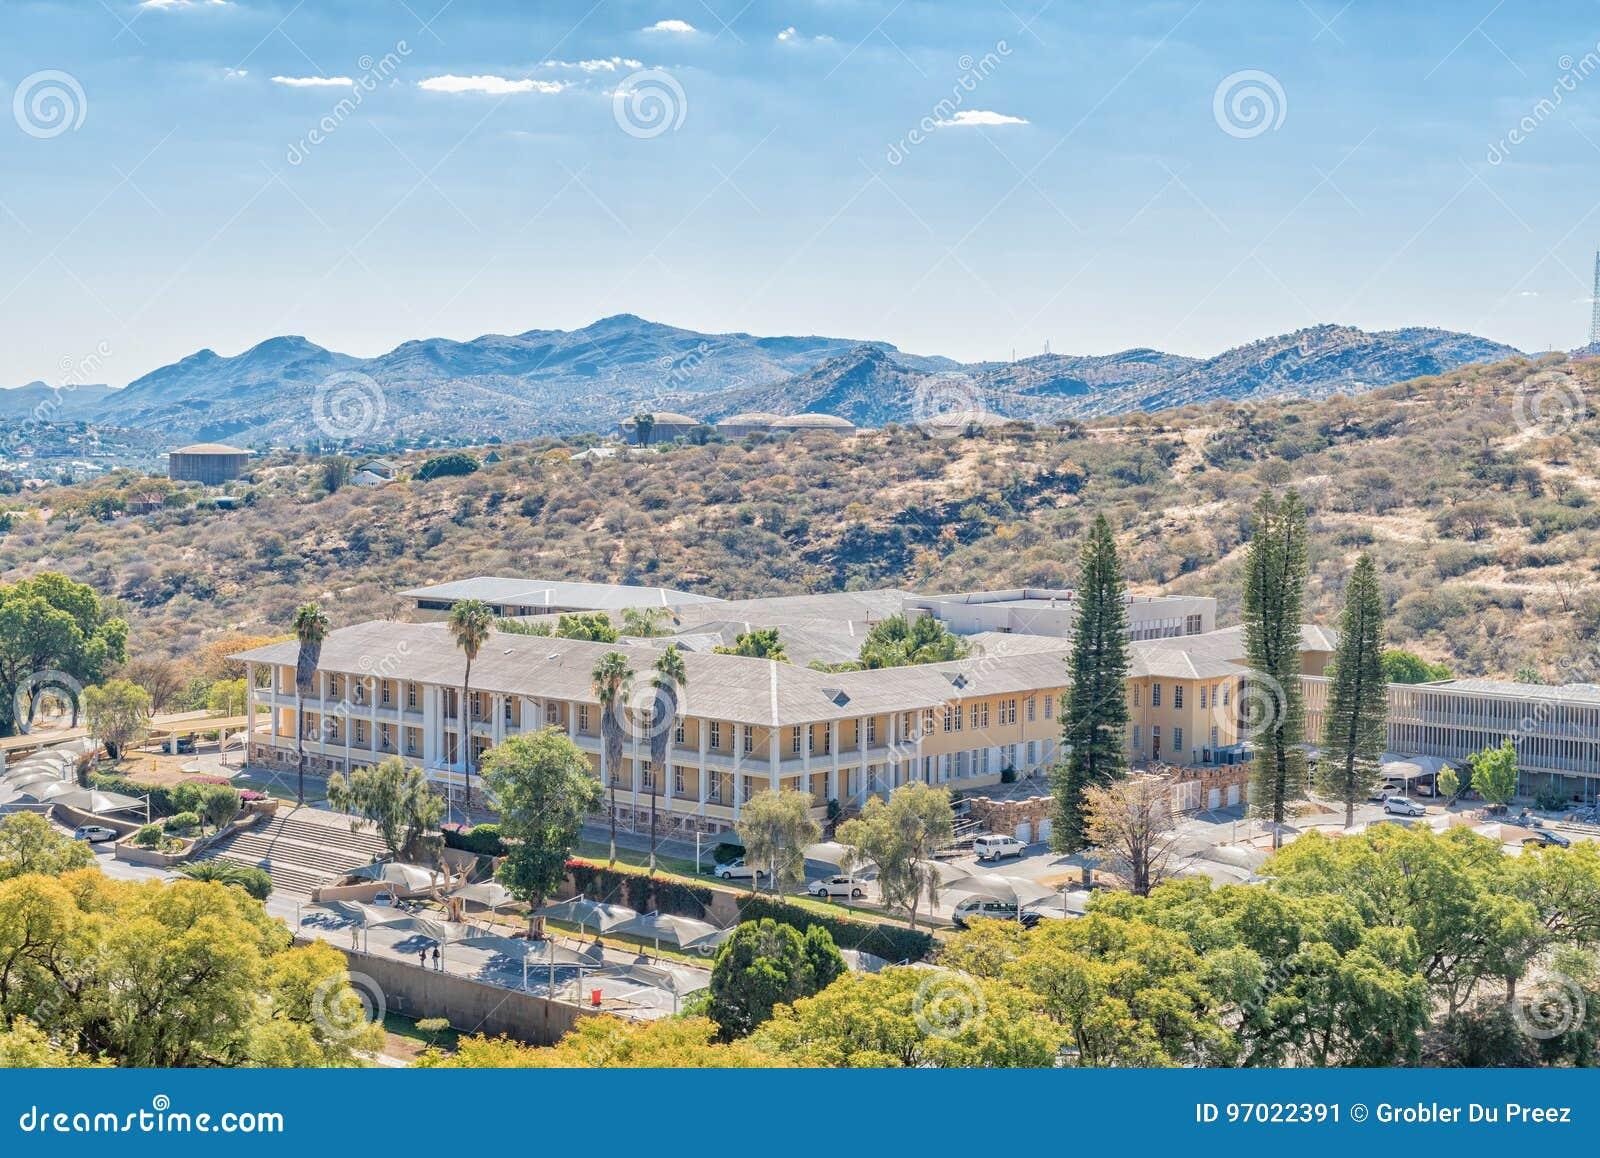 Tintenpalast, the Namibian parliament buildings in Windhoek